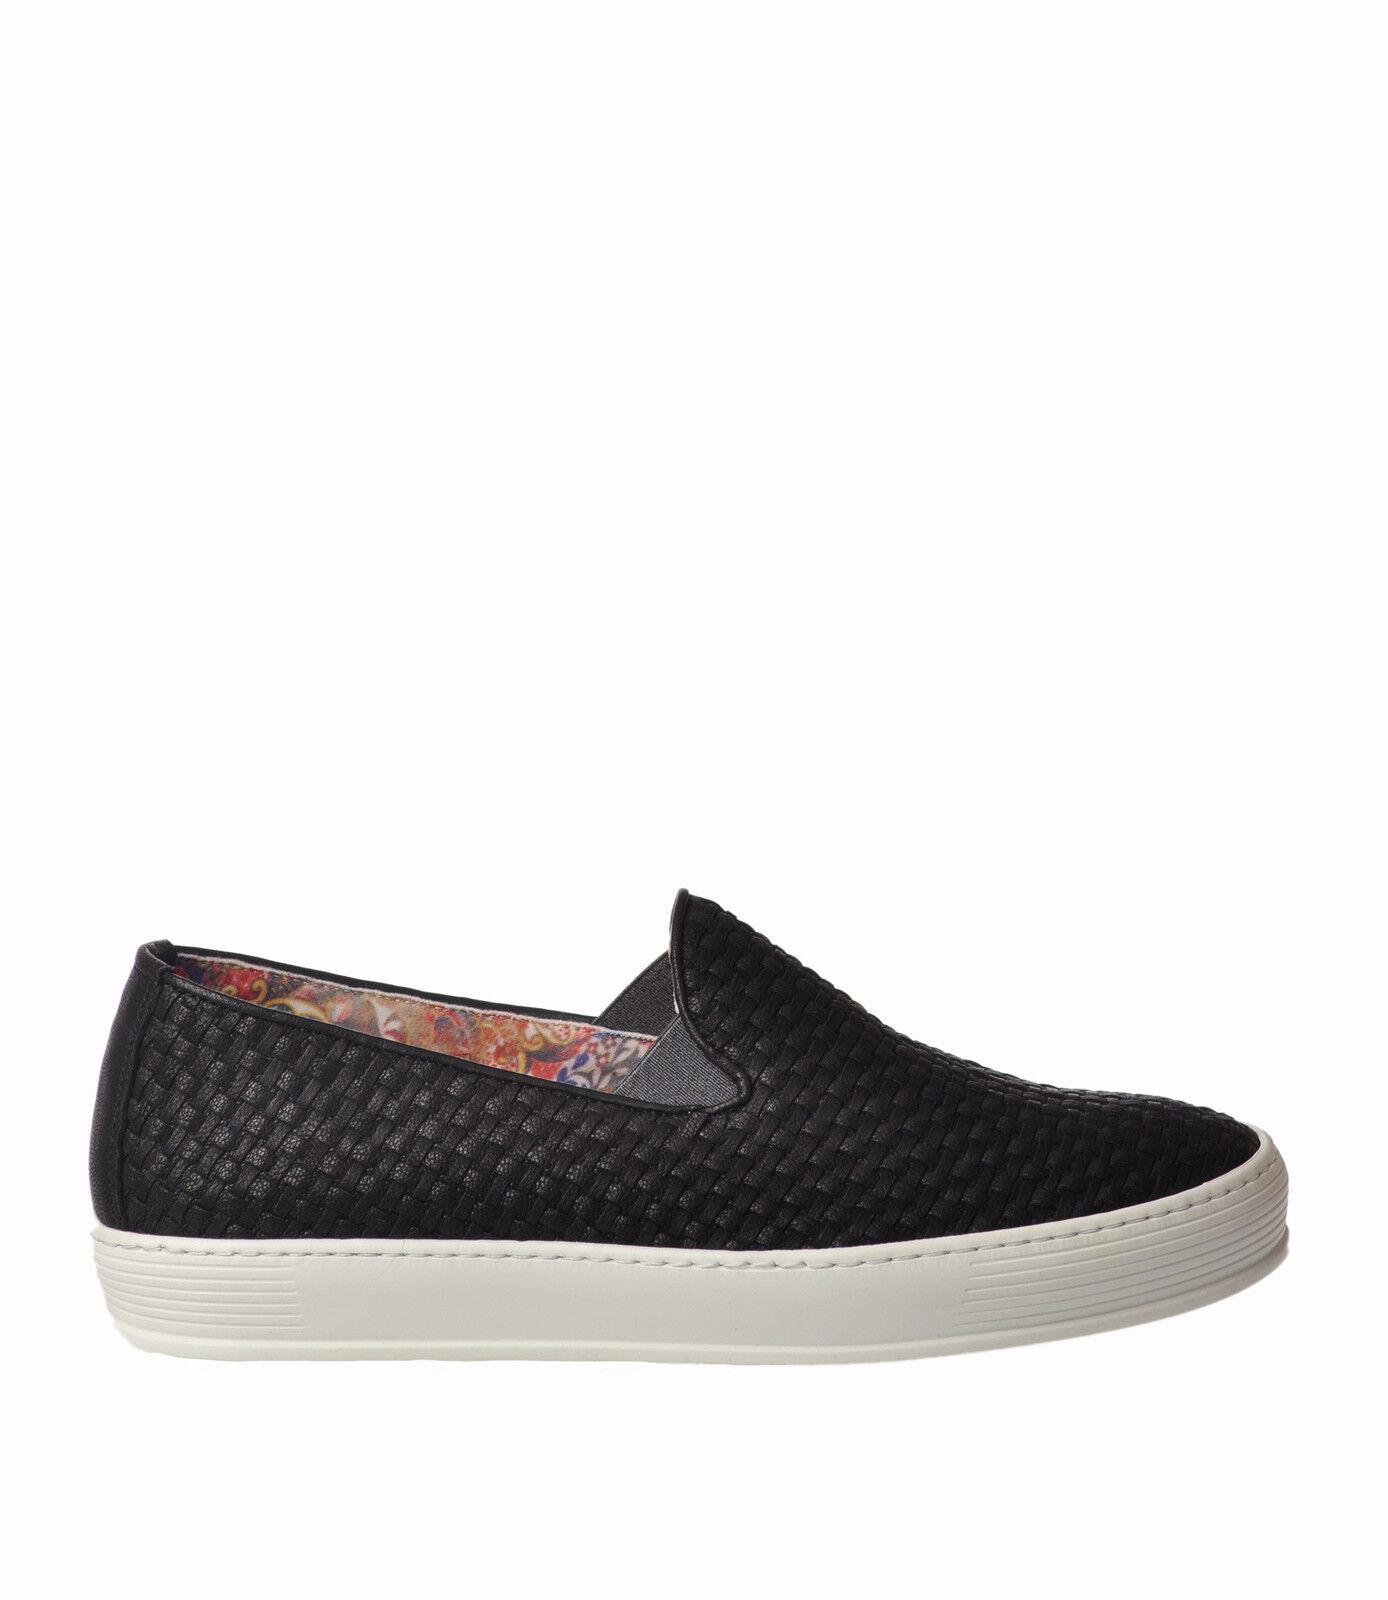 FLOW - Scarpe-Sneakers basse - - Uomo - Nero - basse 3699401H180838 0cf91a